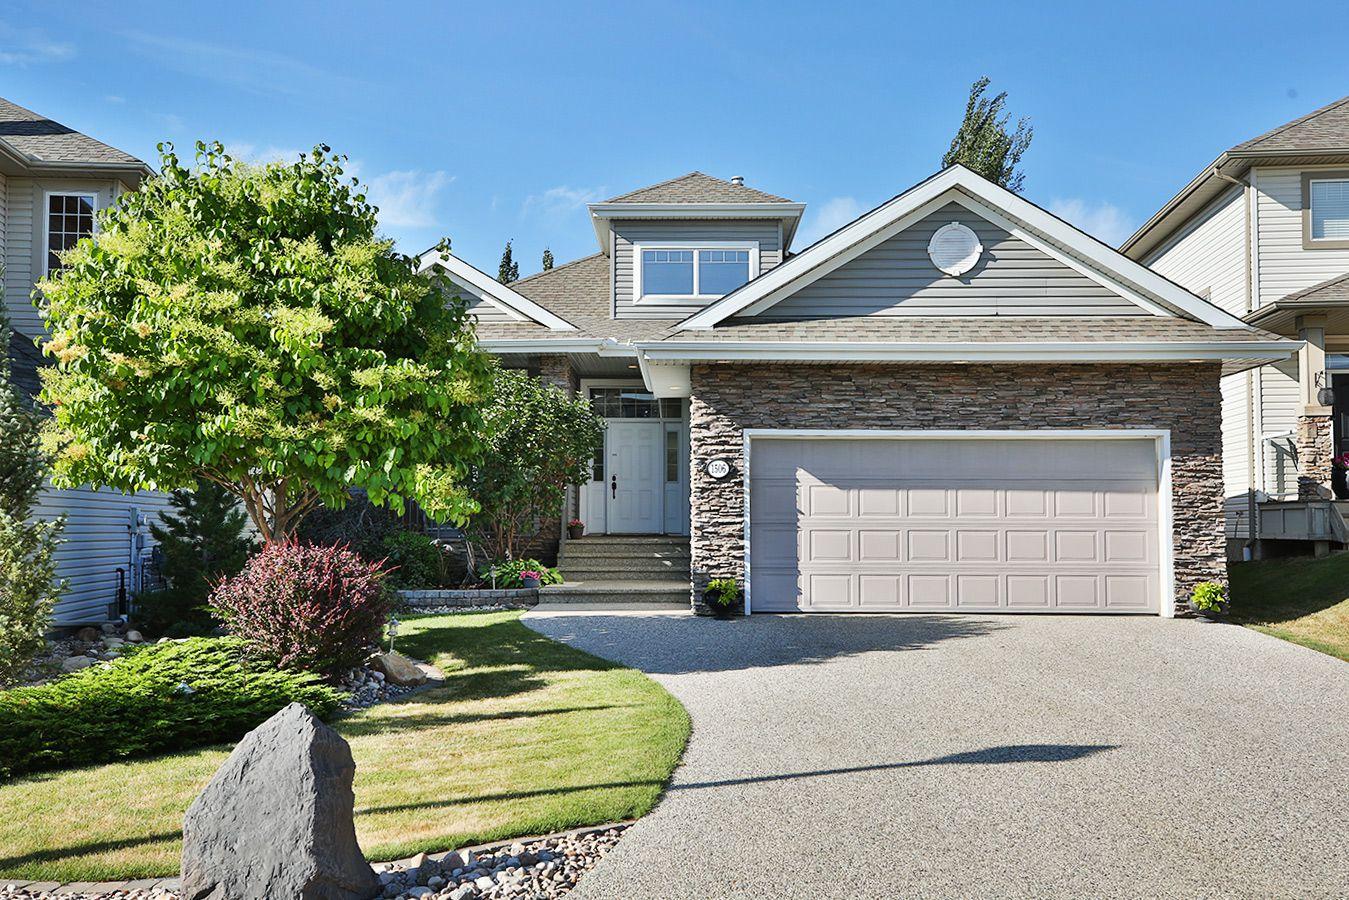 Main Photo: 1506 Blackmore Way NW in Edmonton: Blackmud Creek House for sale : MLS®# E4117917